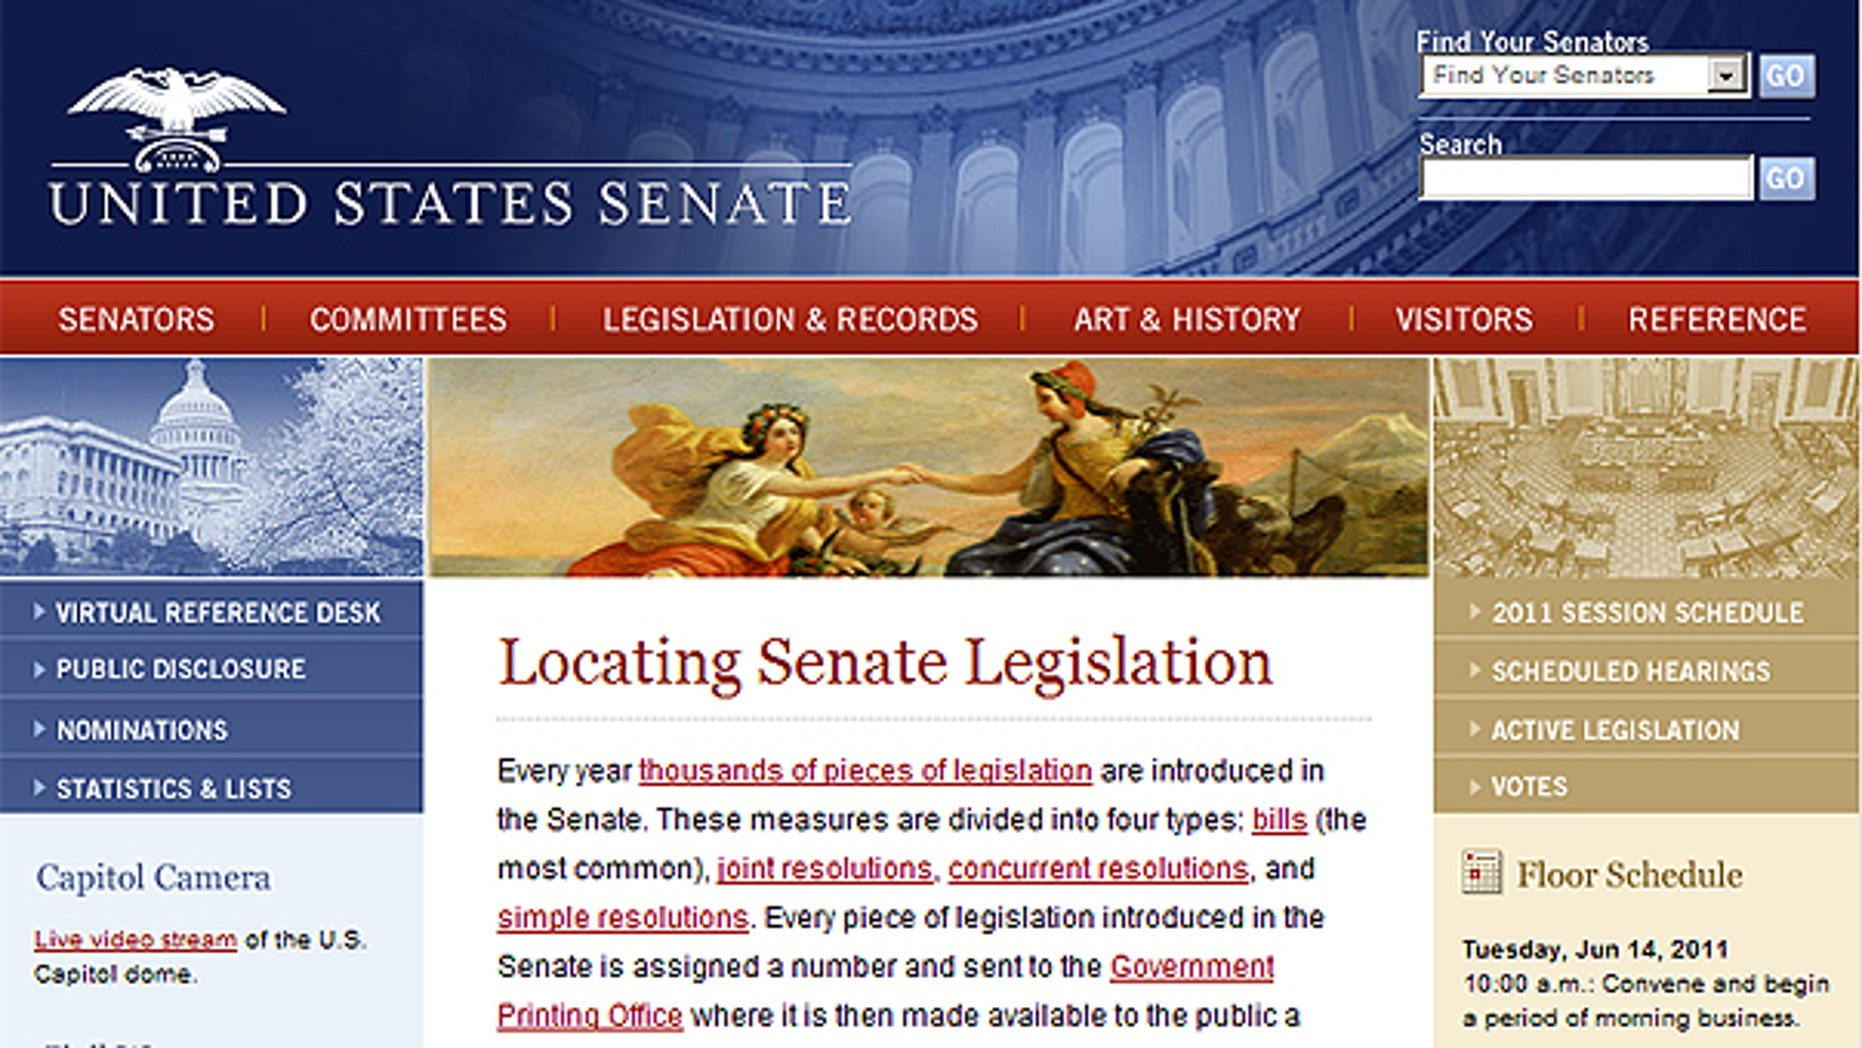 This screengrab shows the homepage of www.senate.gov, the U.S. Senate's website.